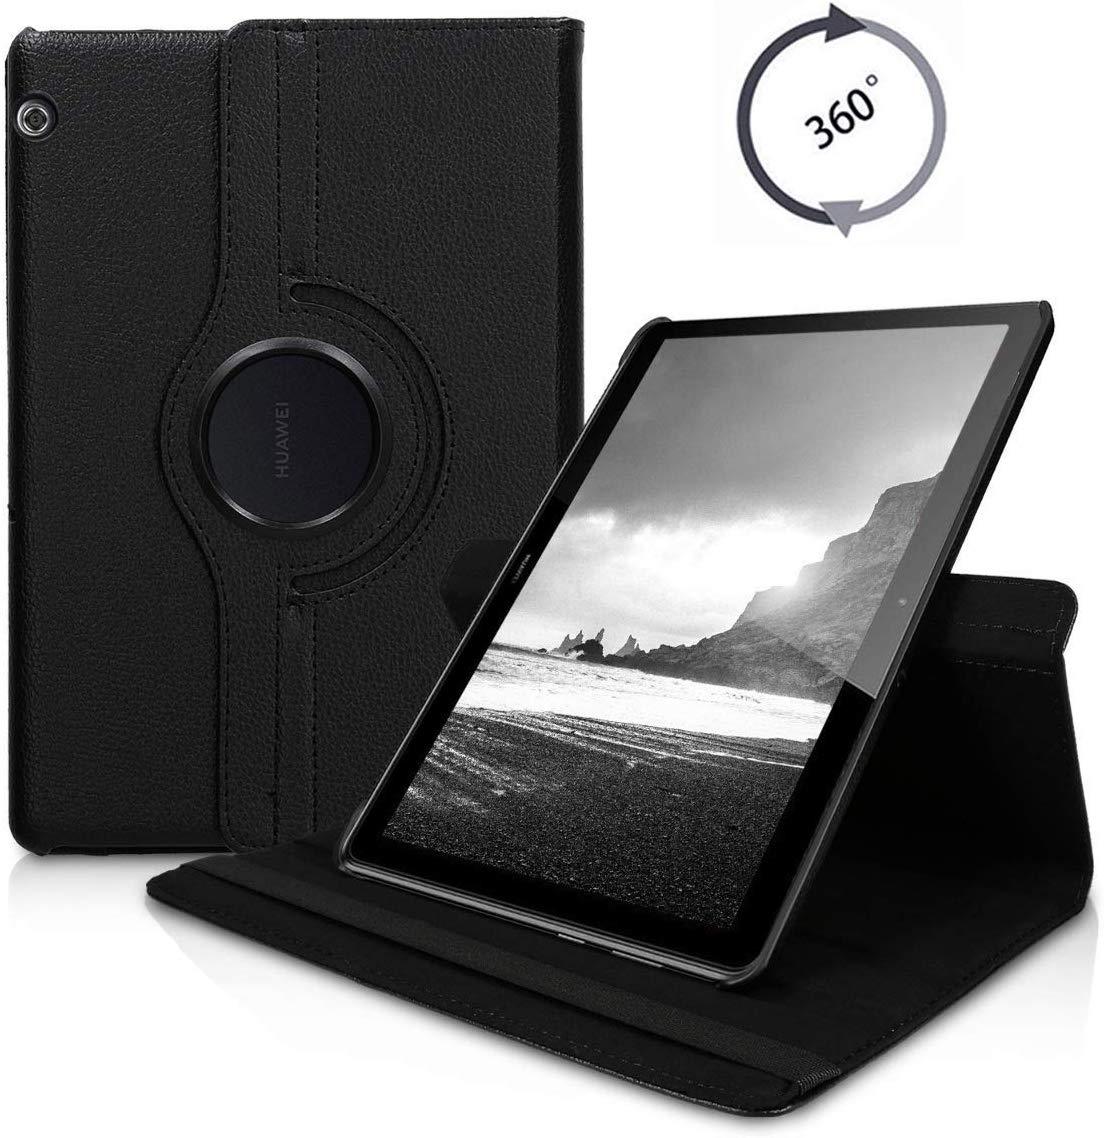 360 градусов вращающийся Флип из искусственной кожи чехол для huawei MediaPad T5 10,1 дюймов AGS2-W09/L09/L03/W19 чехол s Smart Tablet Cover